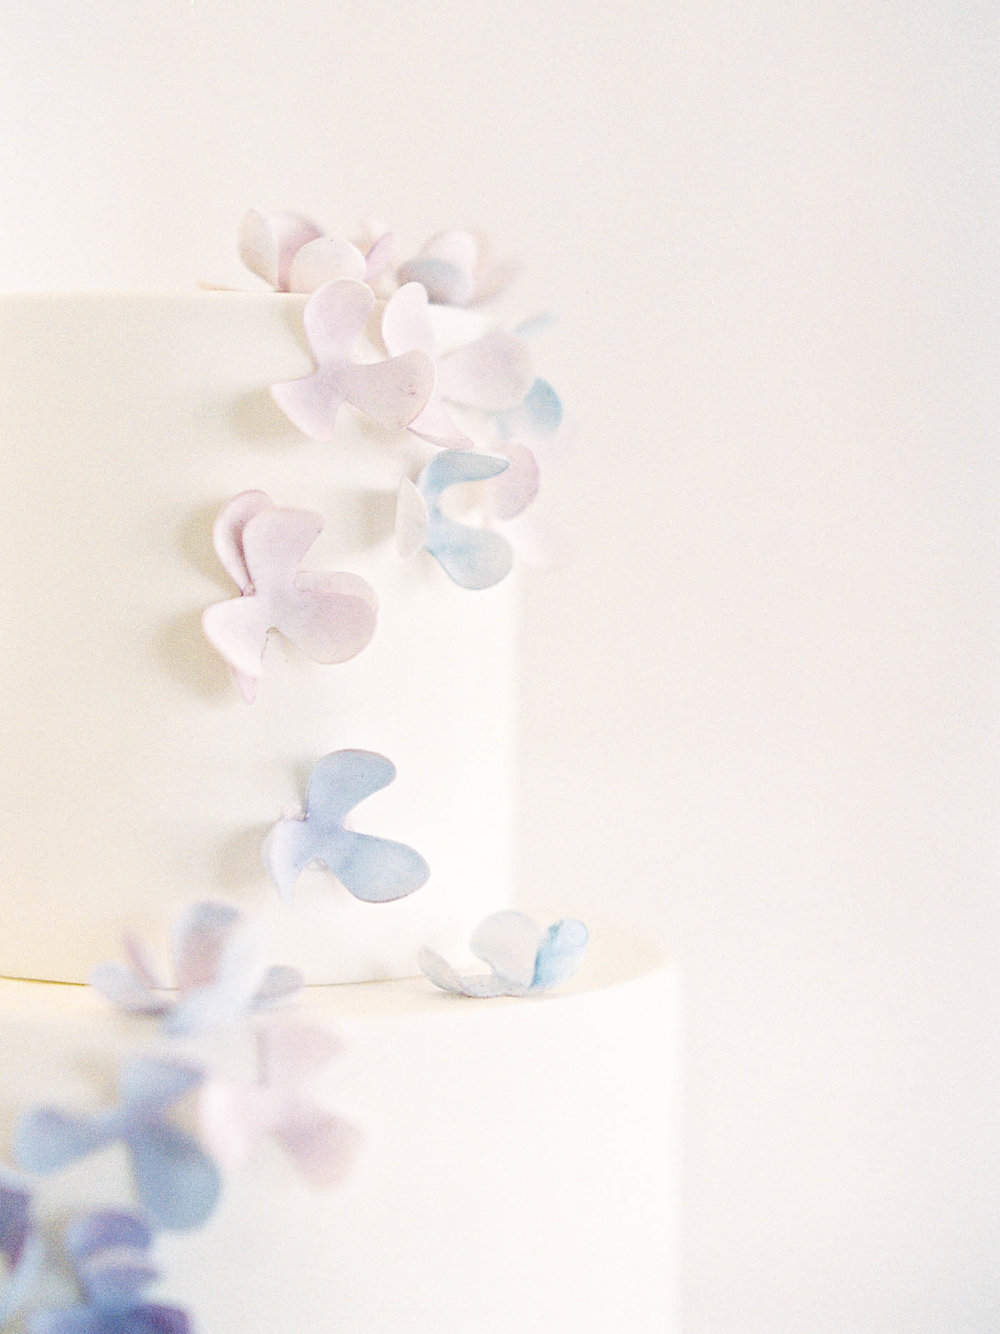 Delicate-Wedding-Cakes-18-Jen_Huang-002344-R1-018.jpg